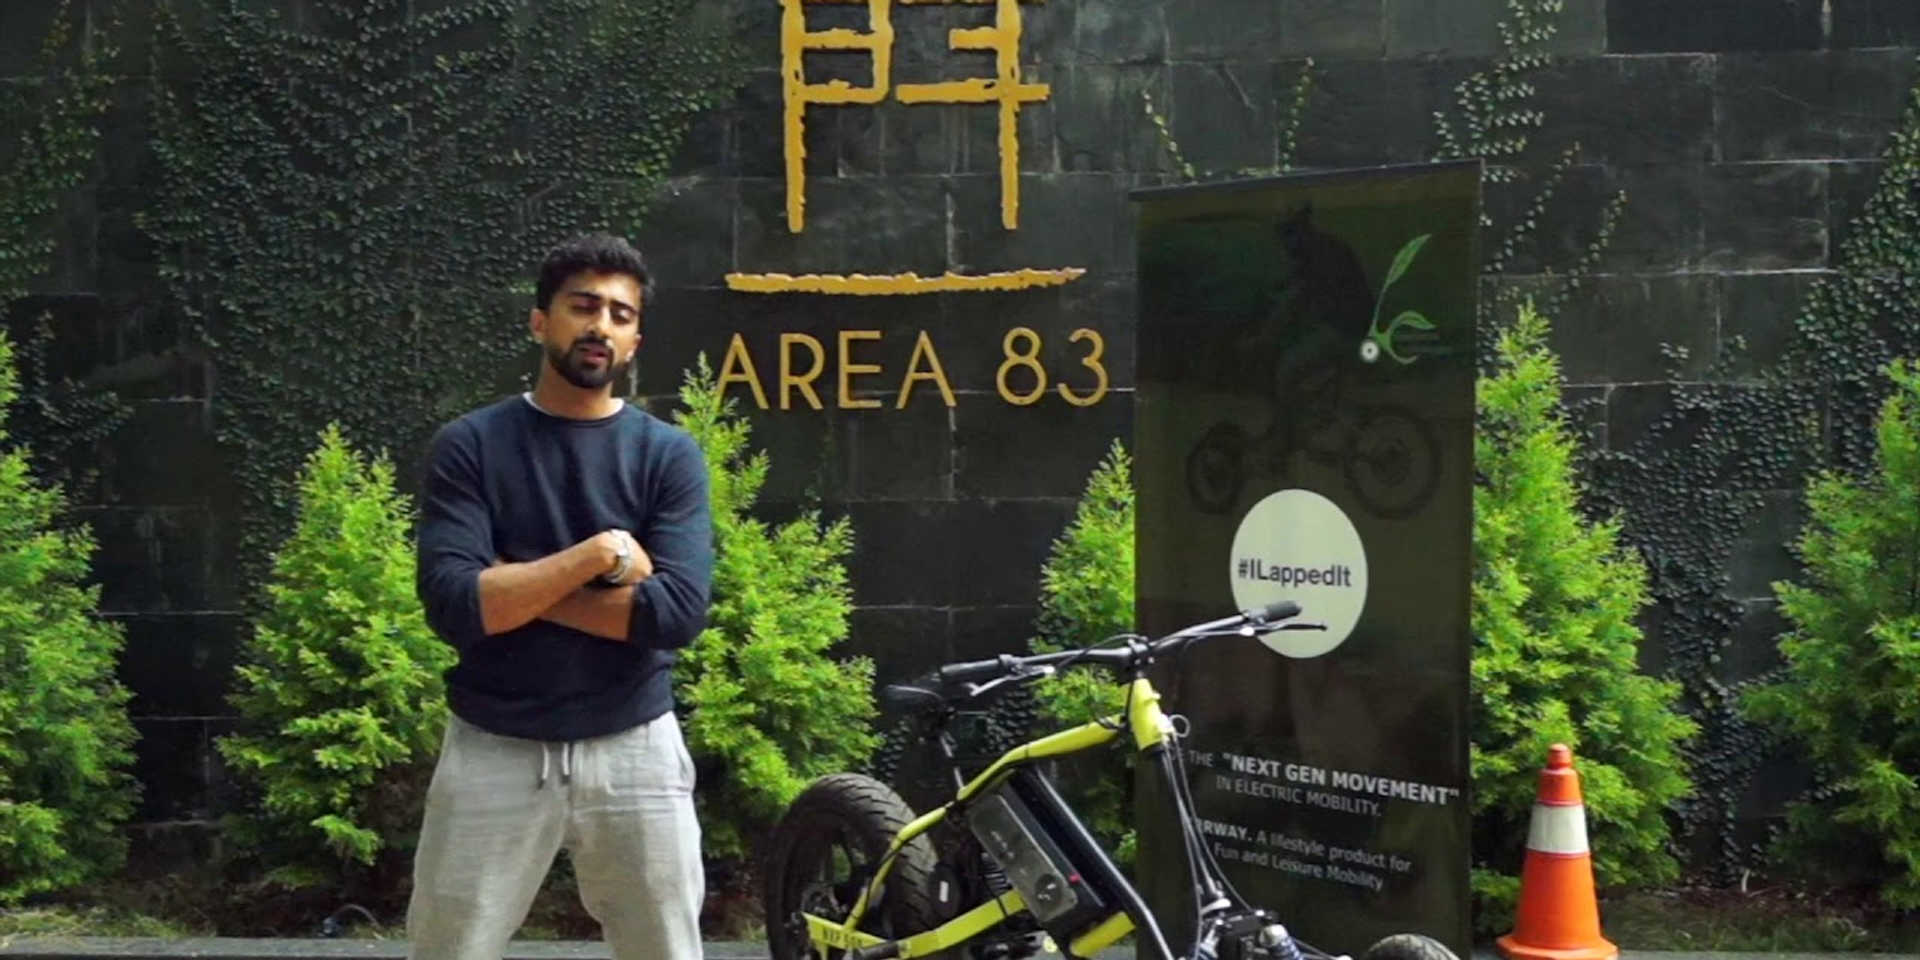 Mr. Tariq Sheriff, Director - Area83 resorts